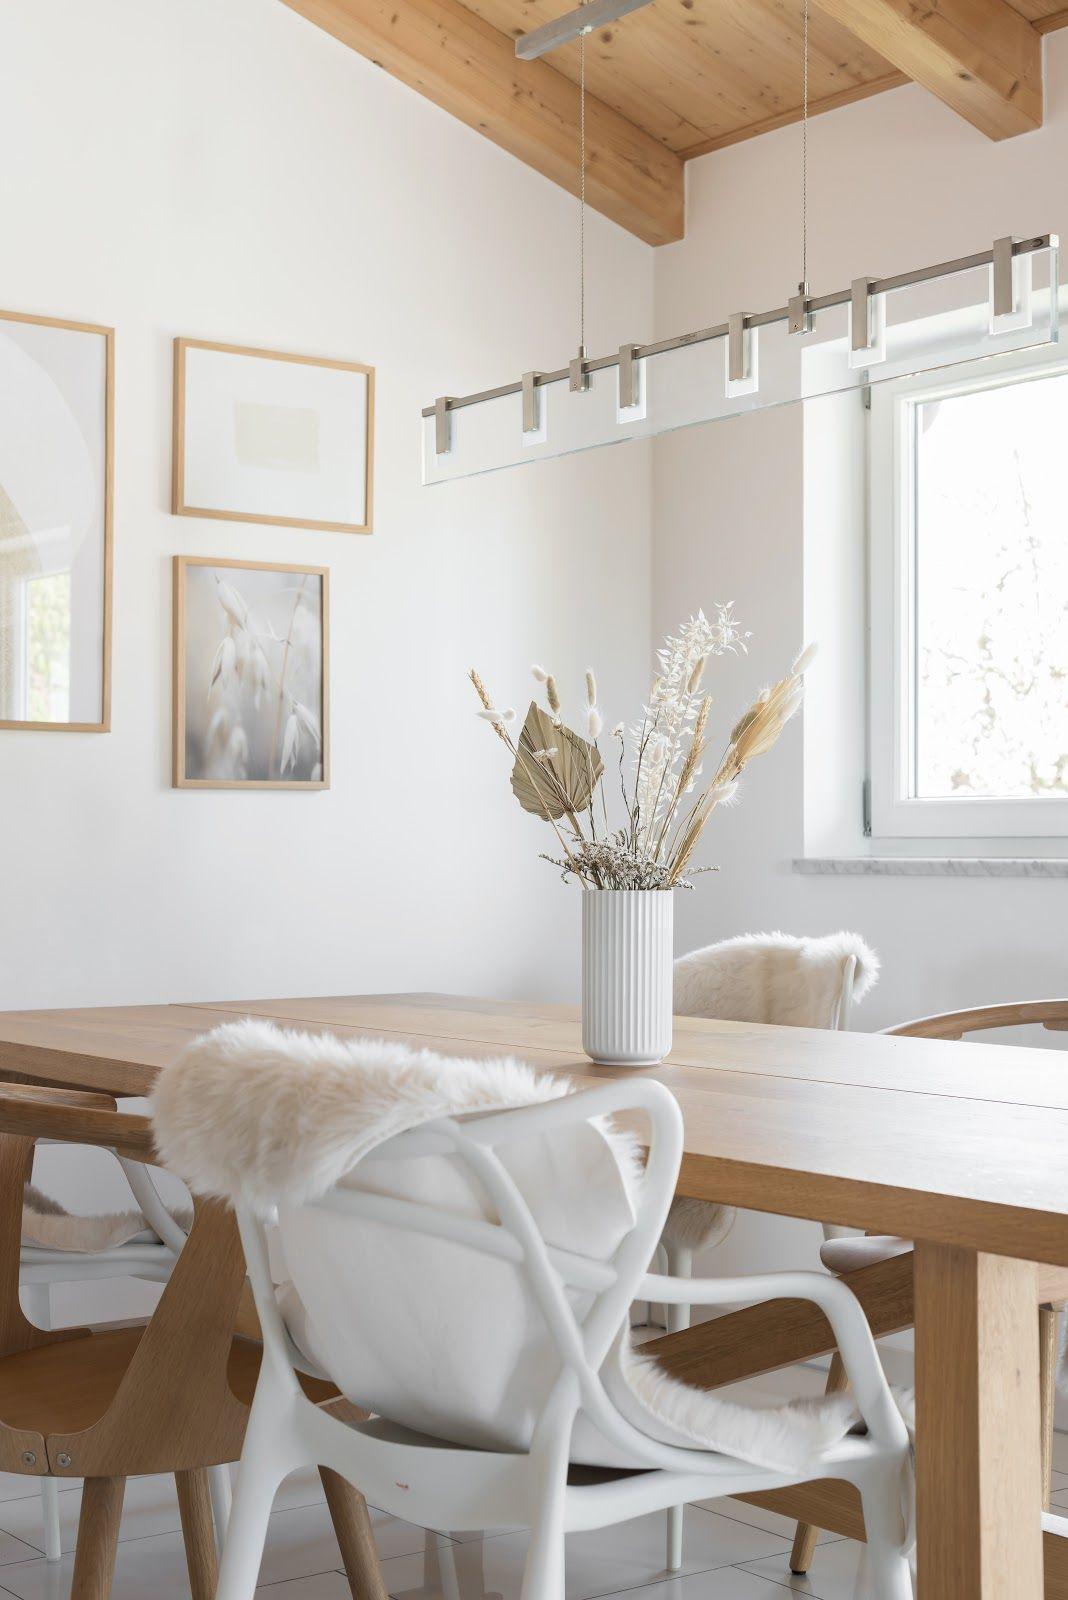 TROCKENBLUMEN SIND WIEDER IM TREND #Dried flowers #interior #diningroom #flowers #interiordesign #lyngby #whiteinterior #white #homedecor #inspohome #scandinavian #minimalsm #nordicliving #nordichome #home #myhome #purist #homesweethome